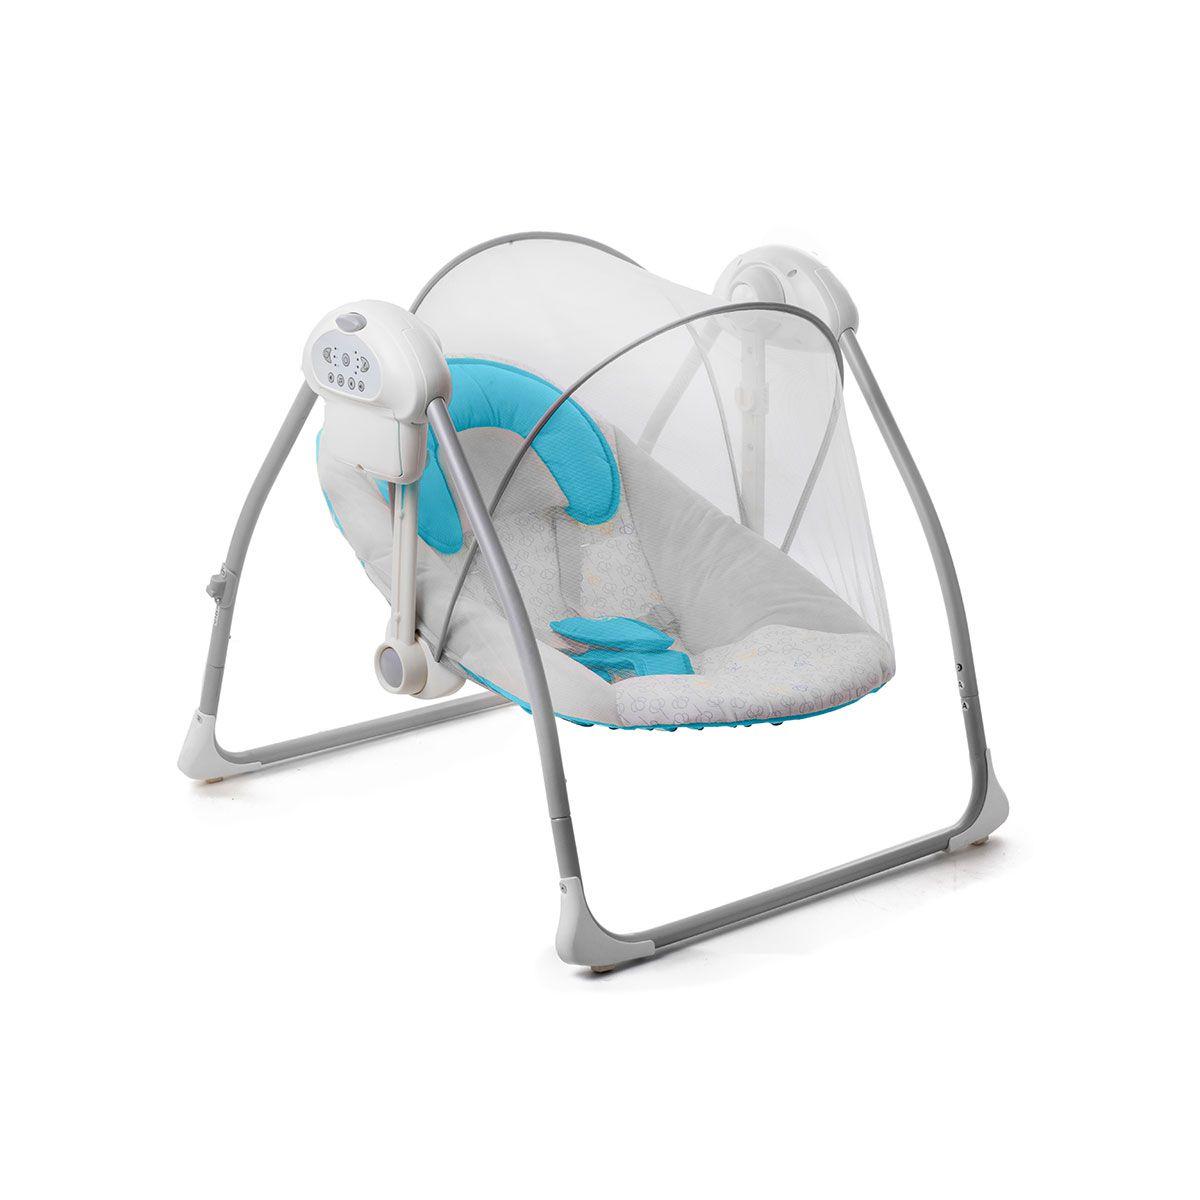 baby chair swinging model no ts bs 16 wedding covers pontefract kinderkraft nani blue bouncing swing seat